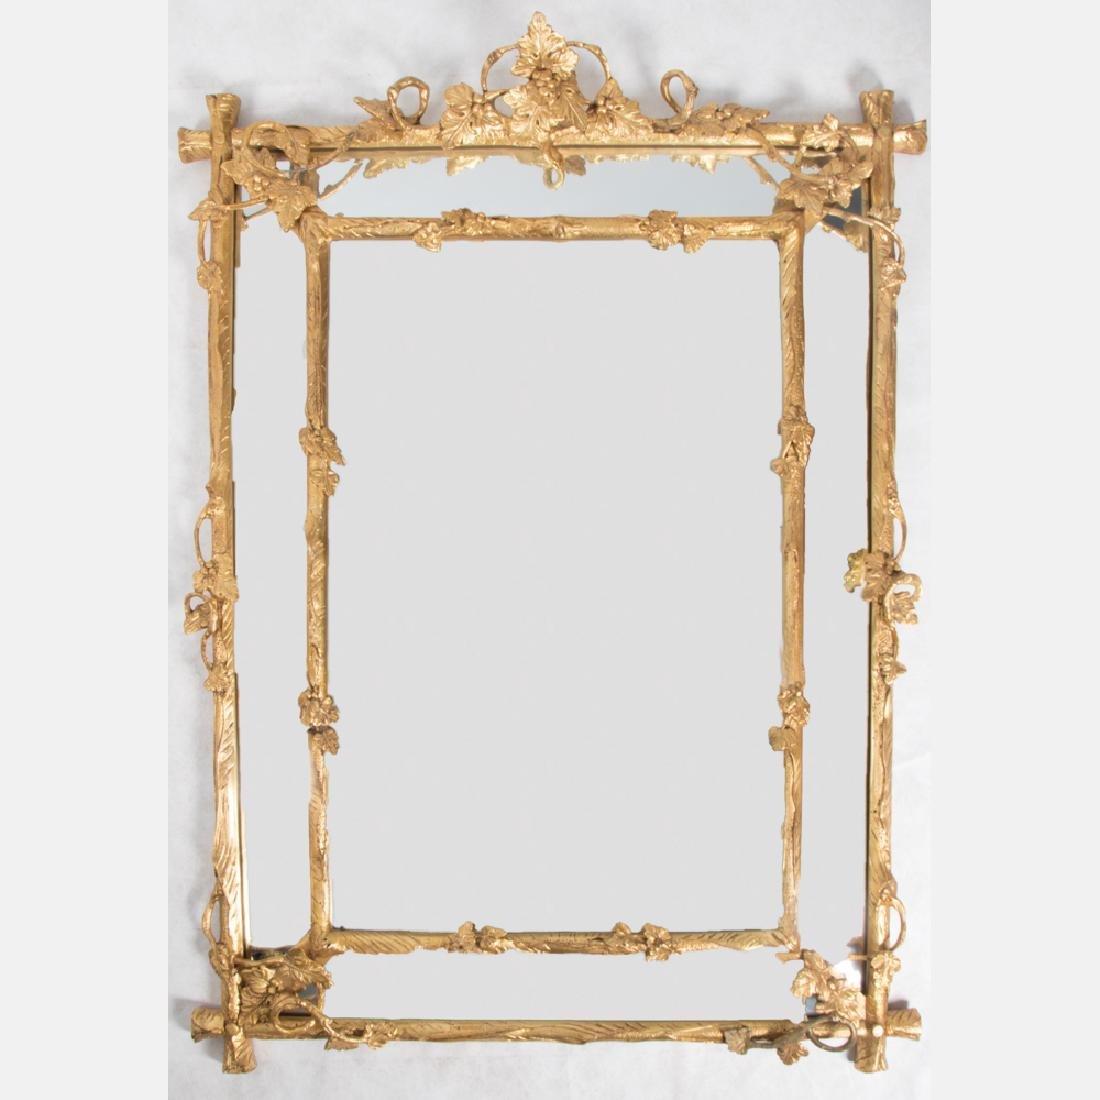 A Gilt Framed Bevel Glass Mirror, 20th Century.